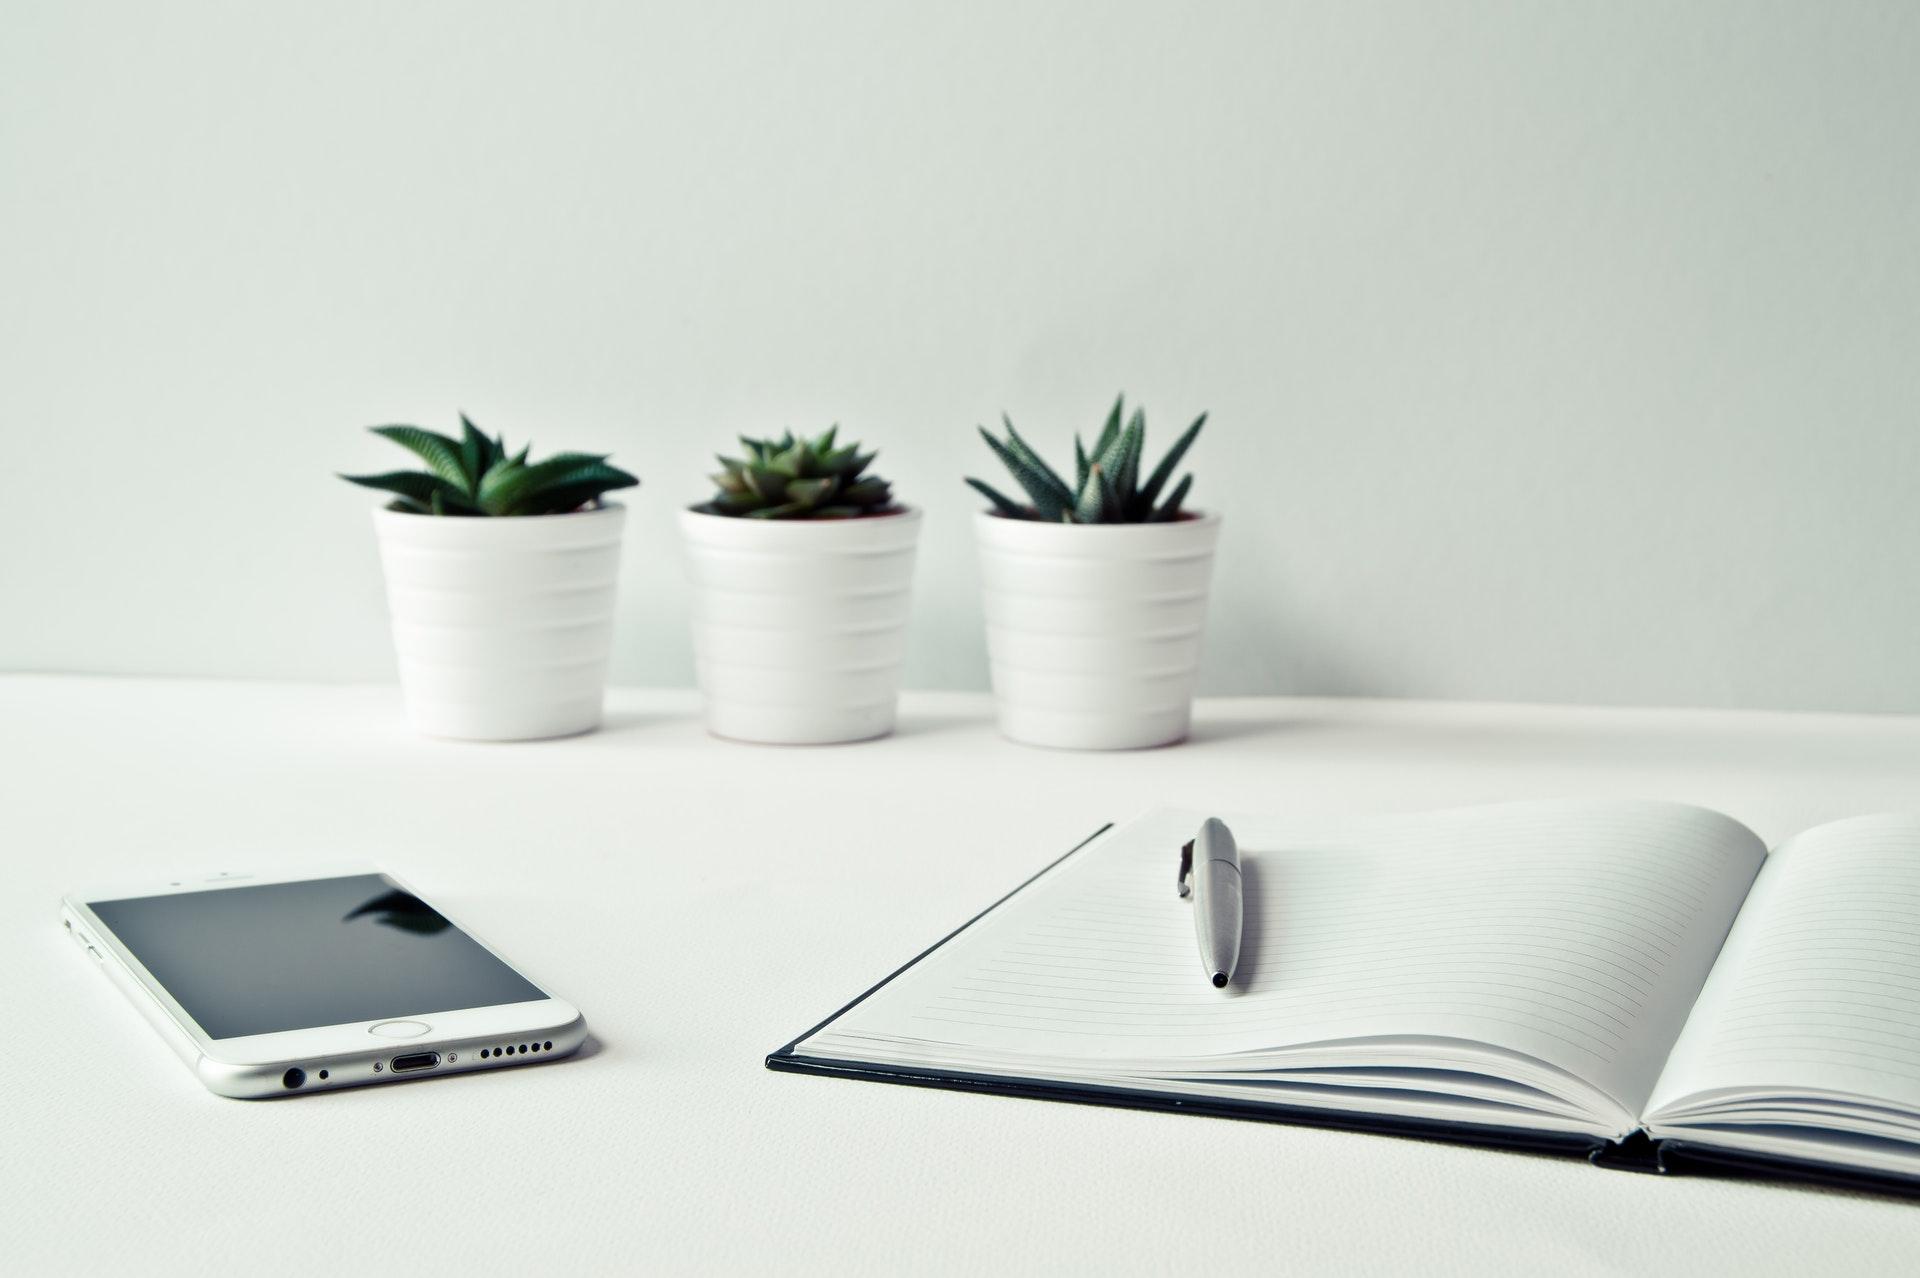 three-white-ceramic-pots-with-green-leaf-plants-near-open-796602.jpg